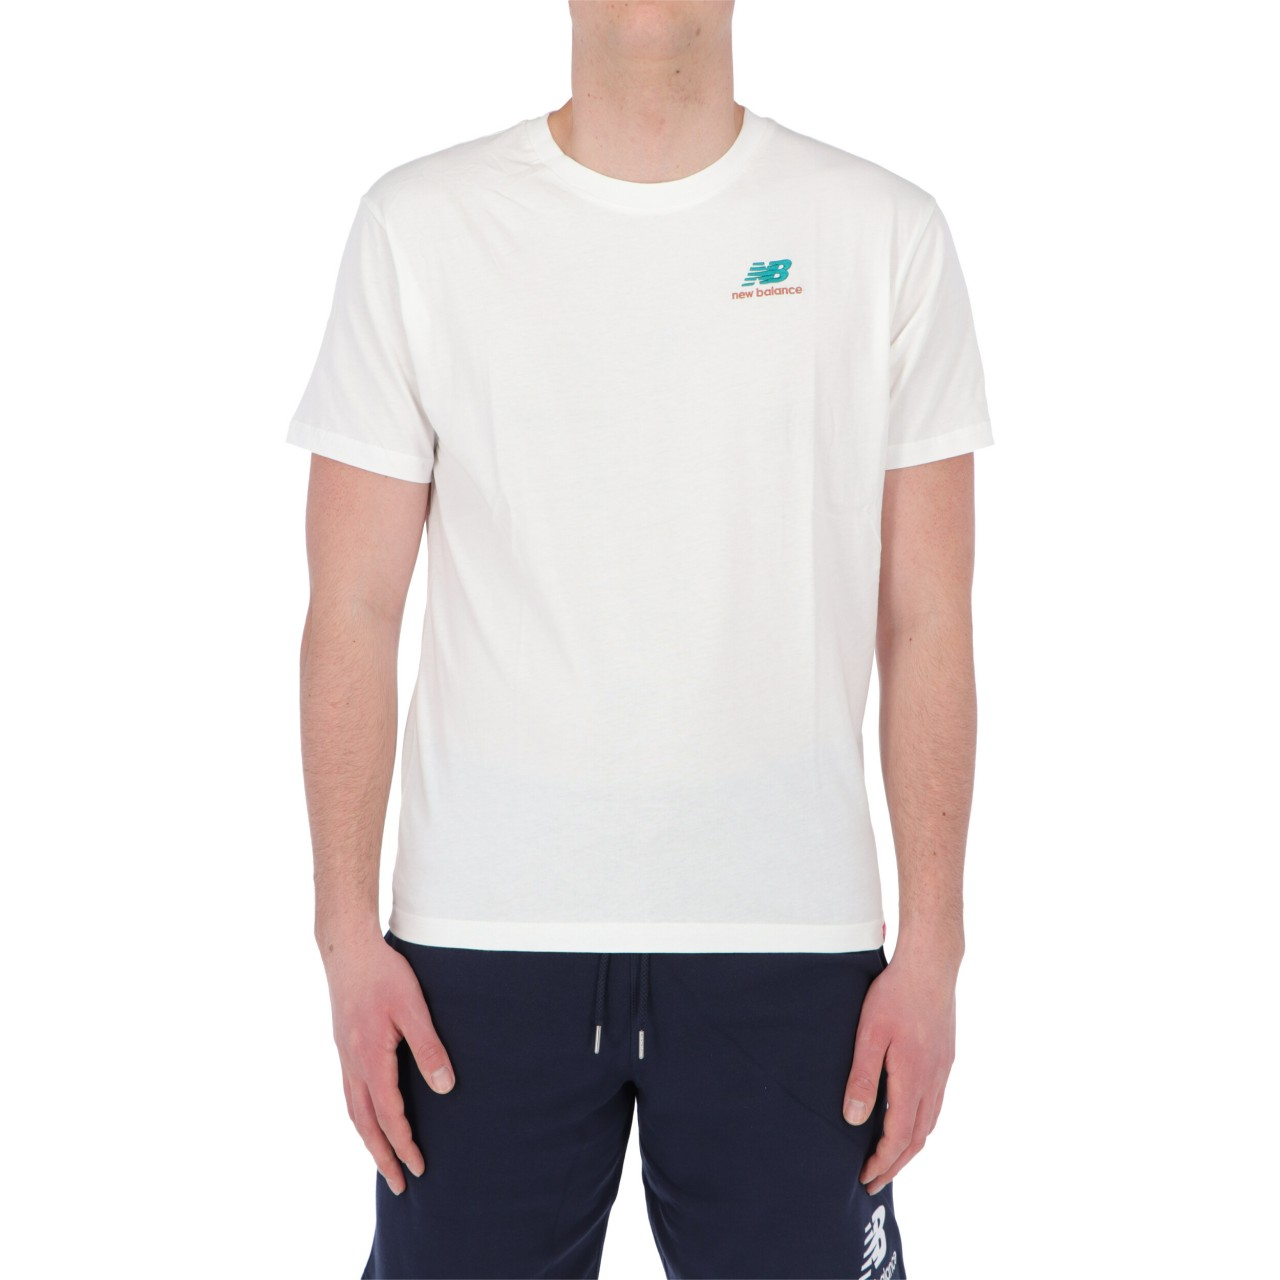 New balance Uomo Tshirt New Balance Uomo Essential Embroidered Tee 11592P